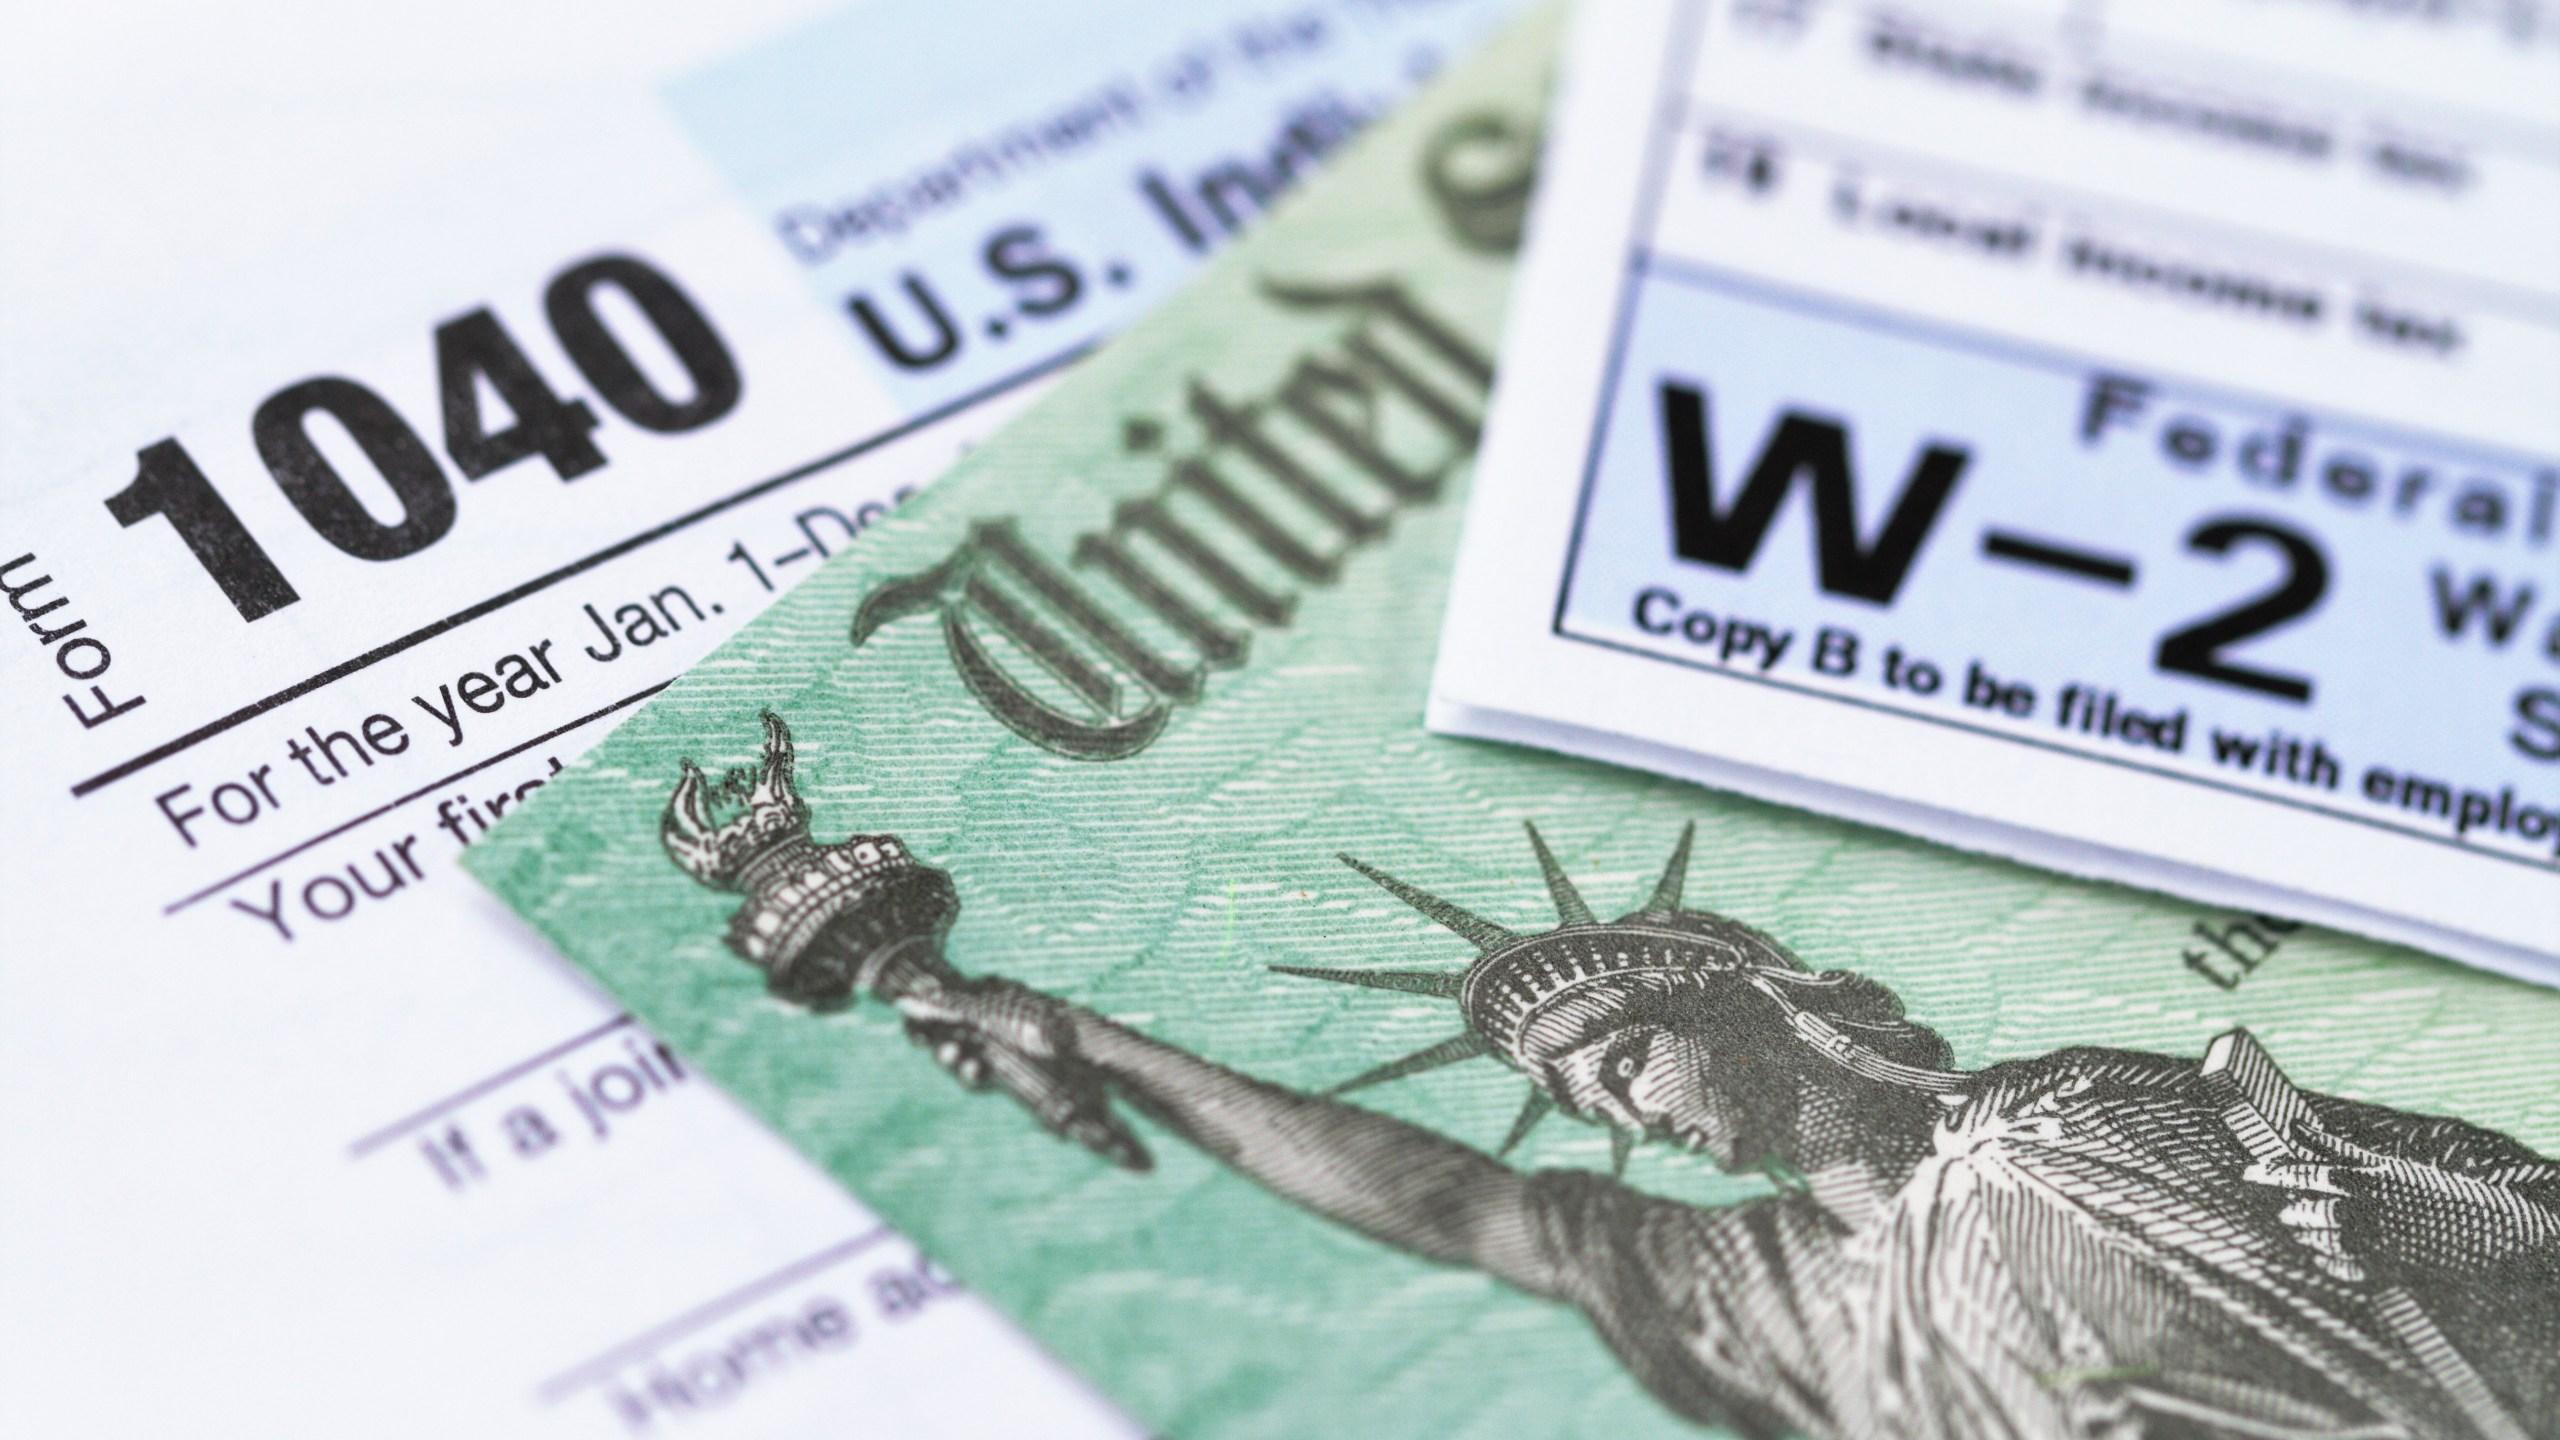 Will child tax credit checks become permanent?